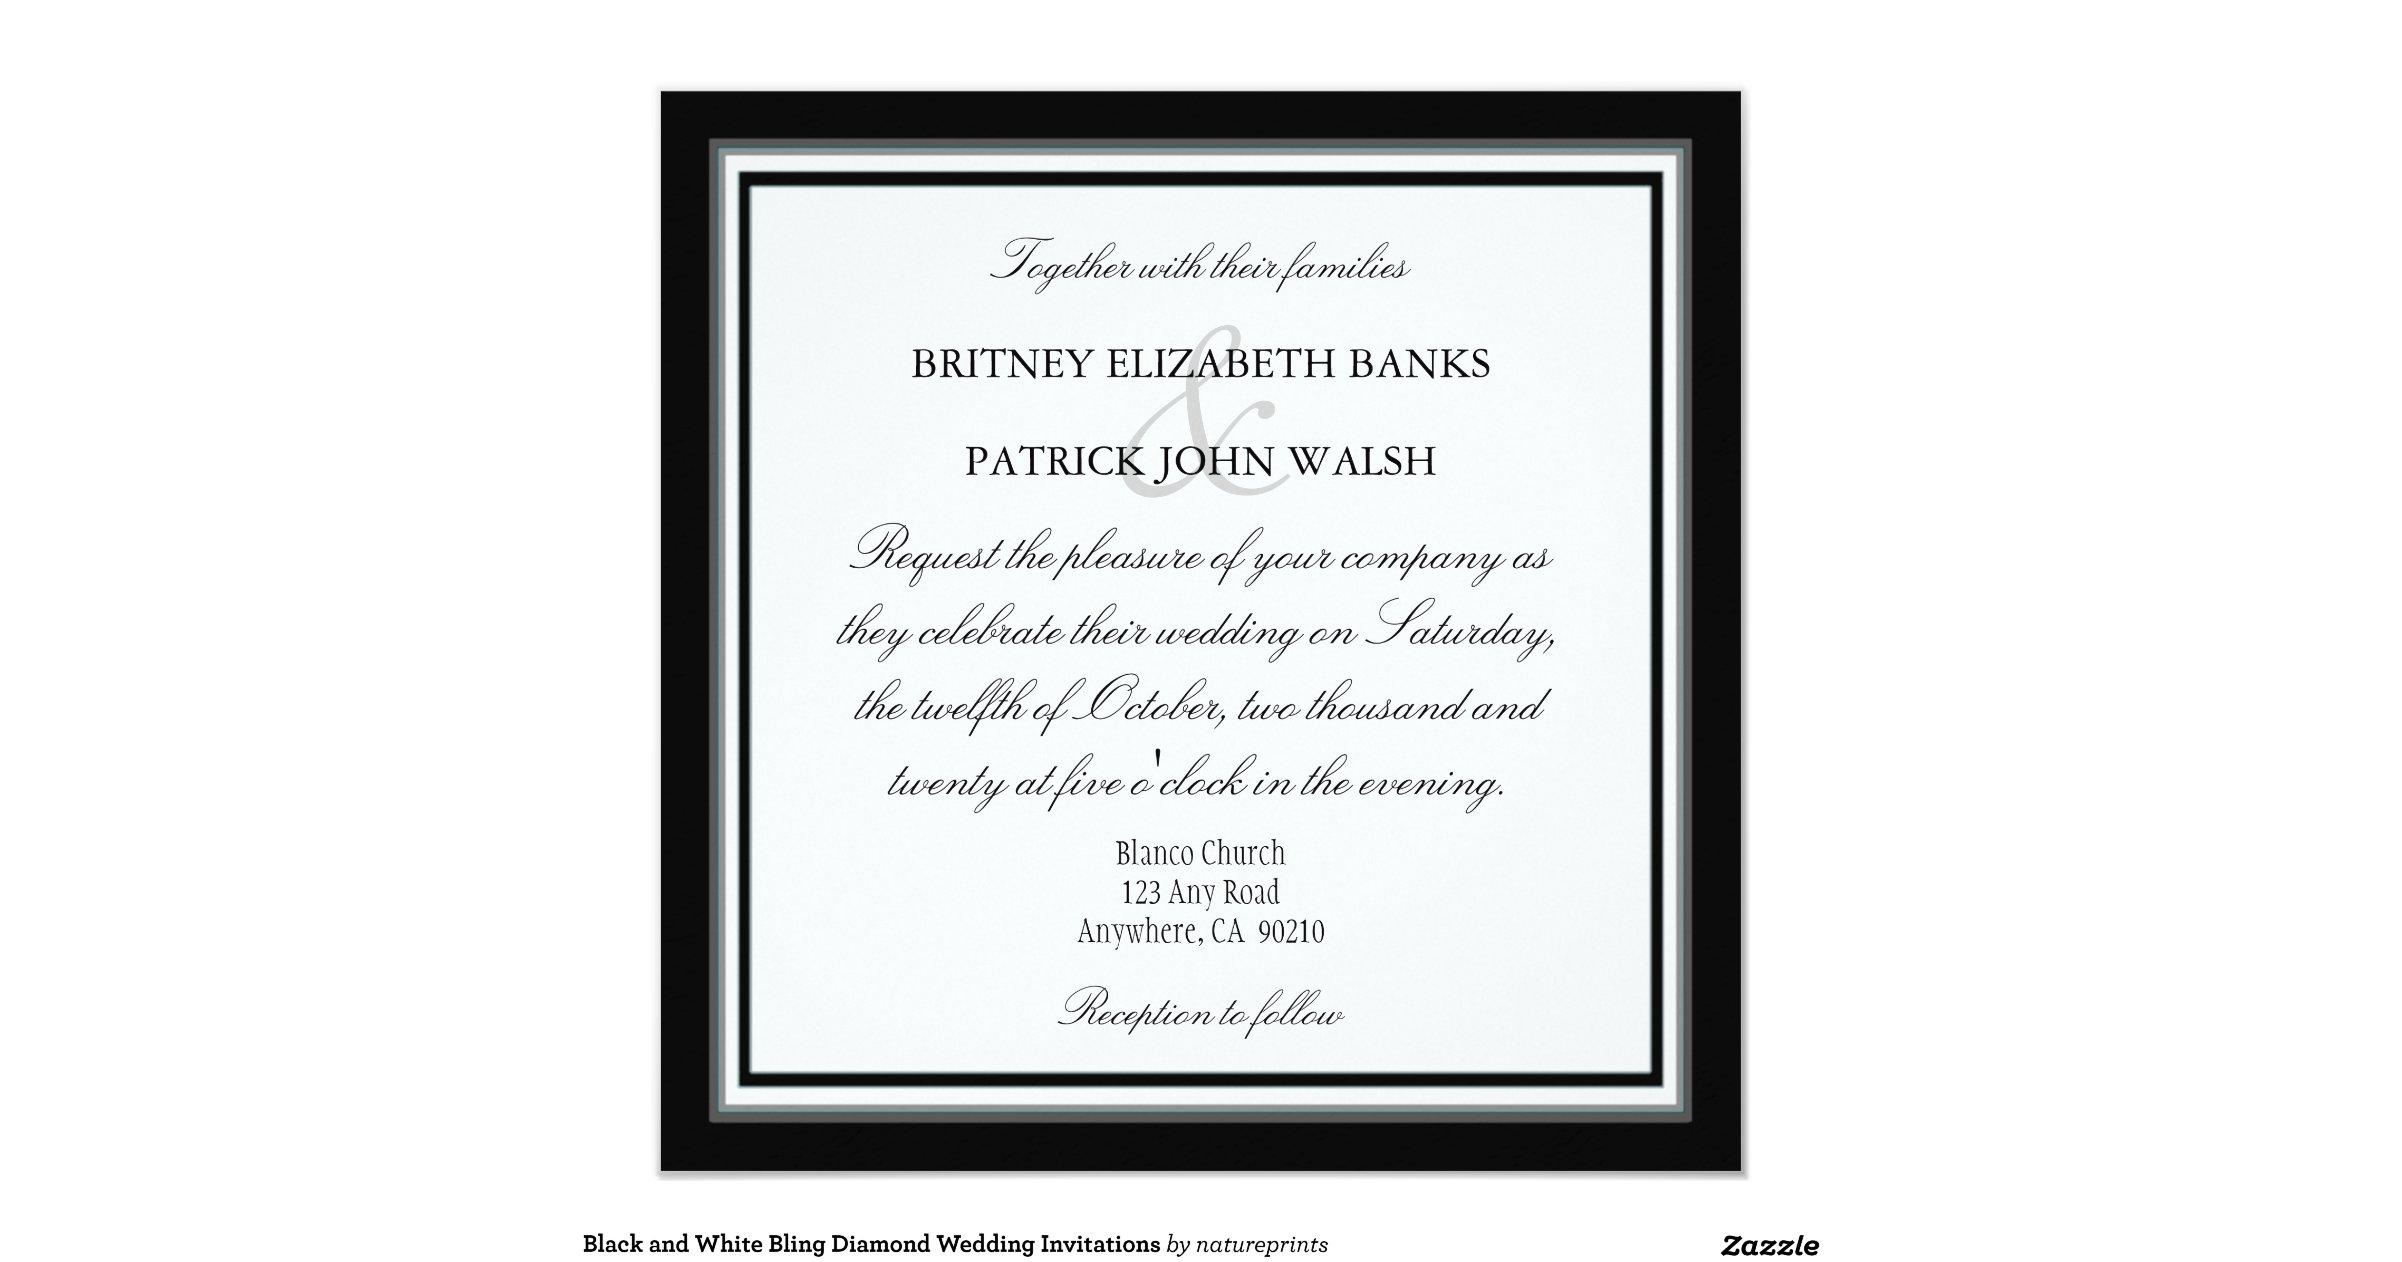 Black and white bling diamond wedding invitations for Black and white bling wedding invitations